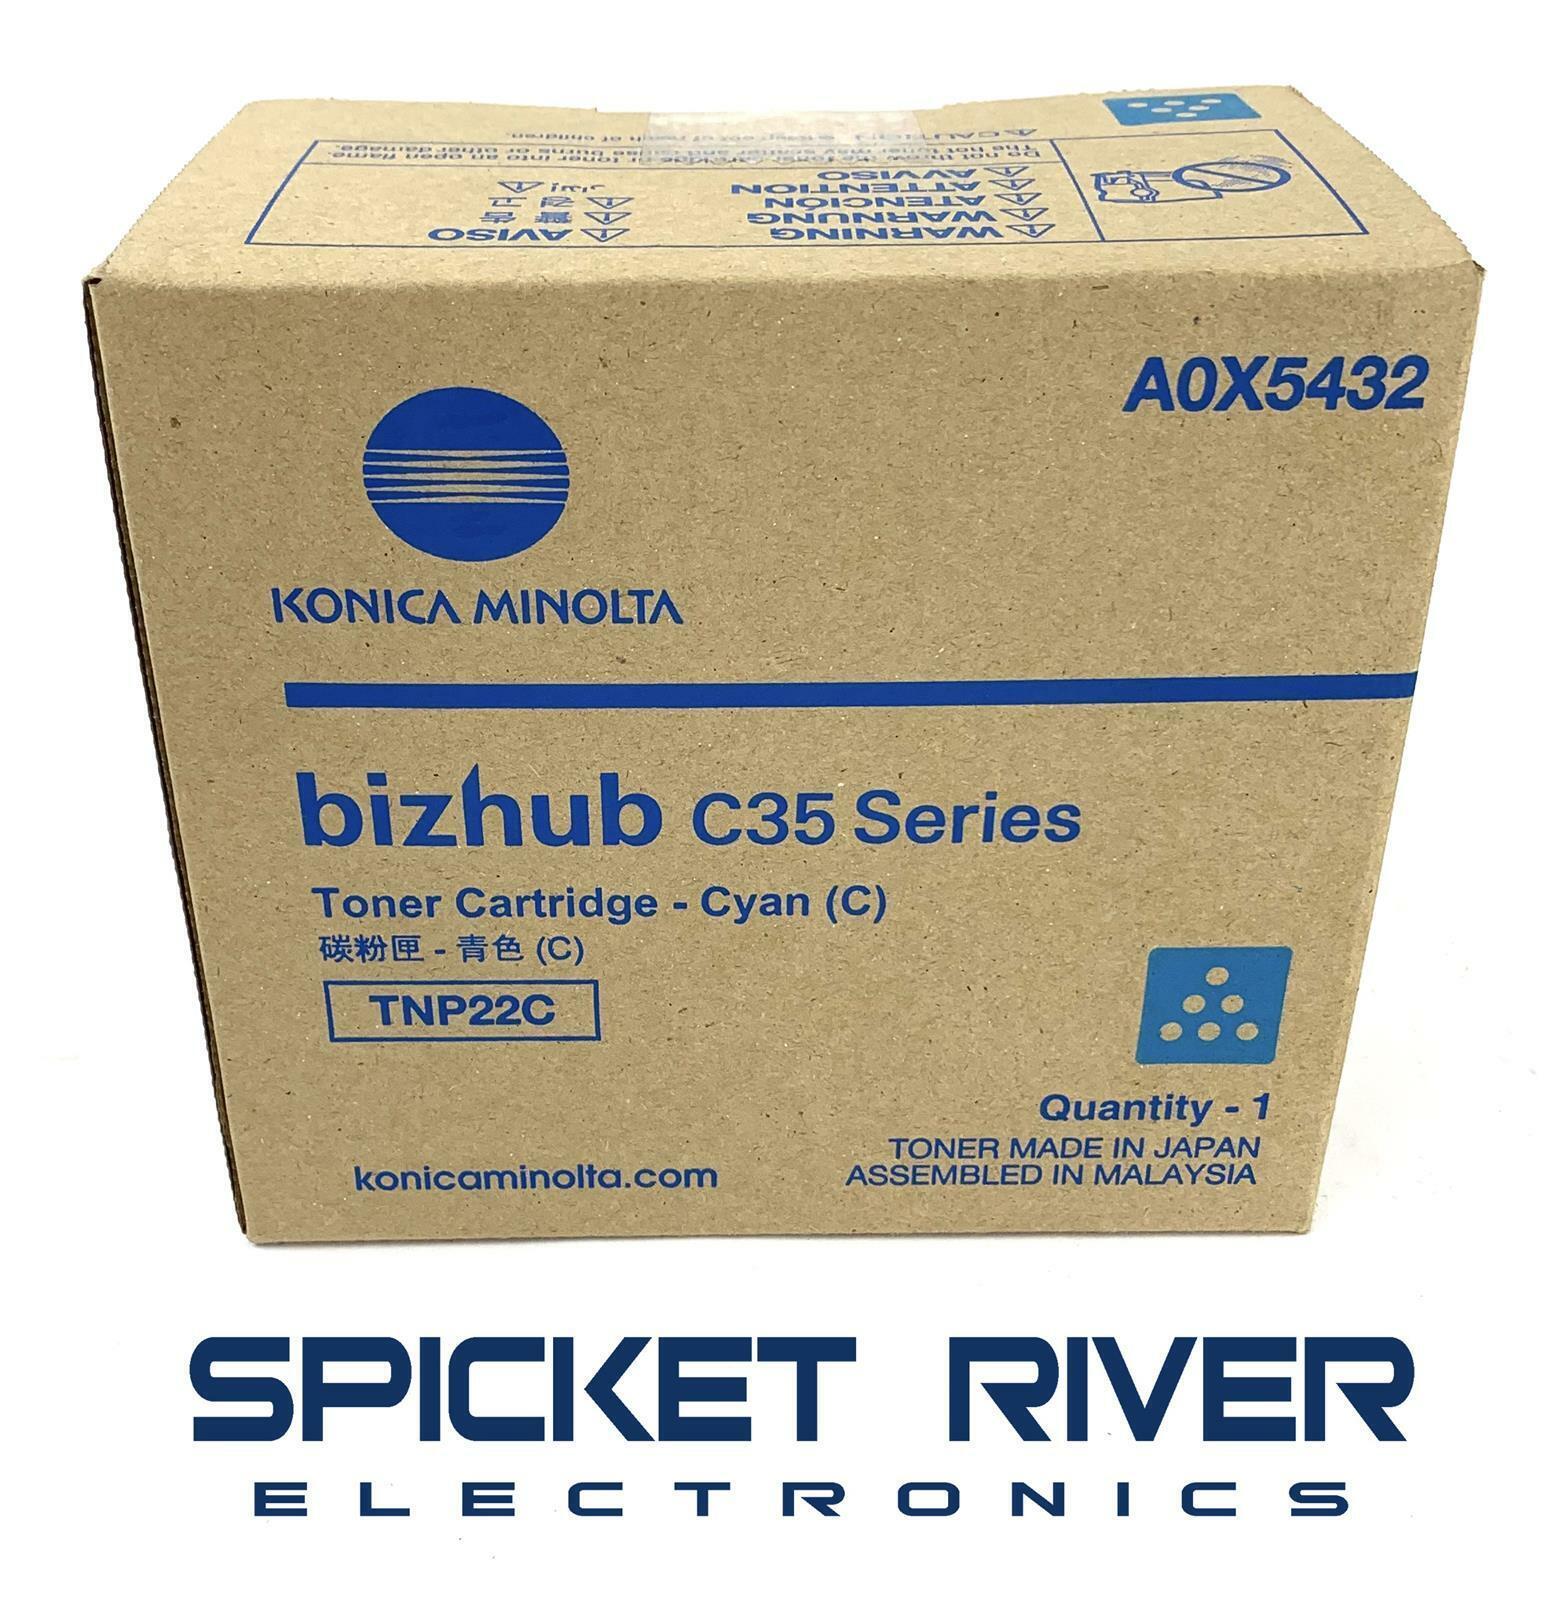 BizHub C35 TNP22C BizHub C35P Replacement Cyan Toner for Konica Minolta A0X5432